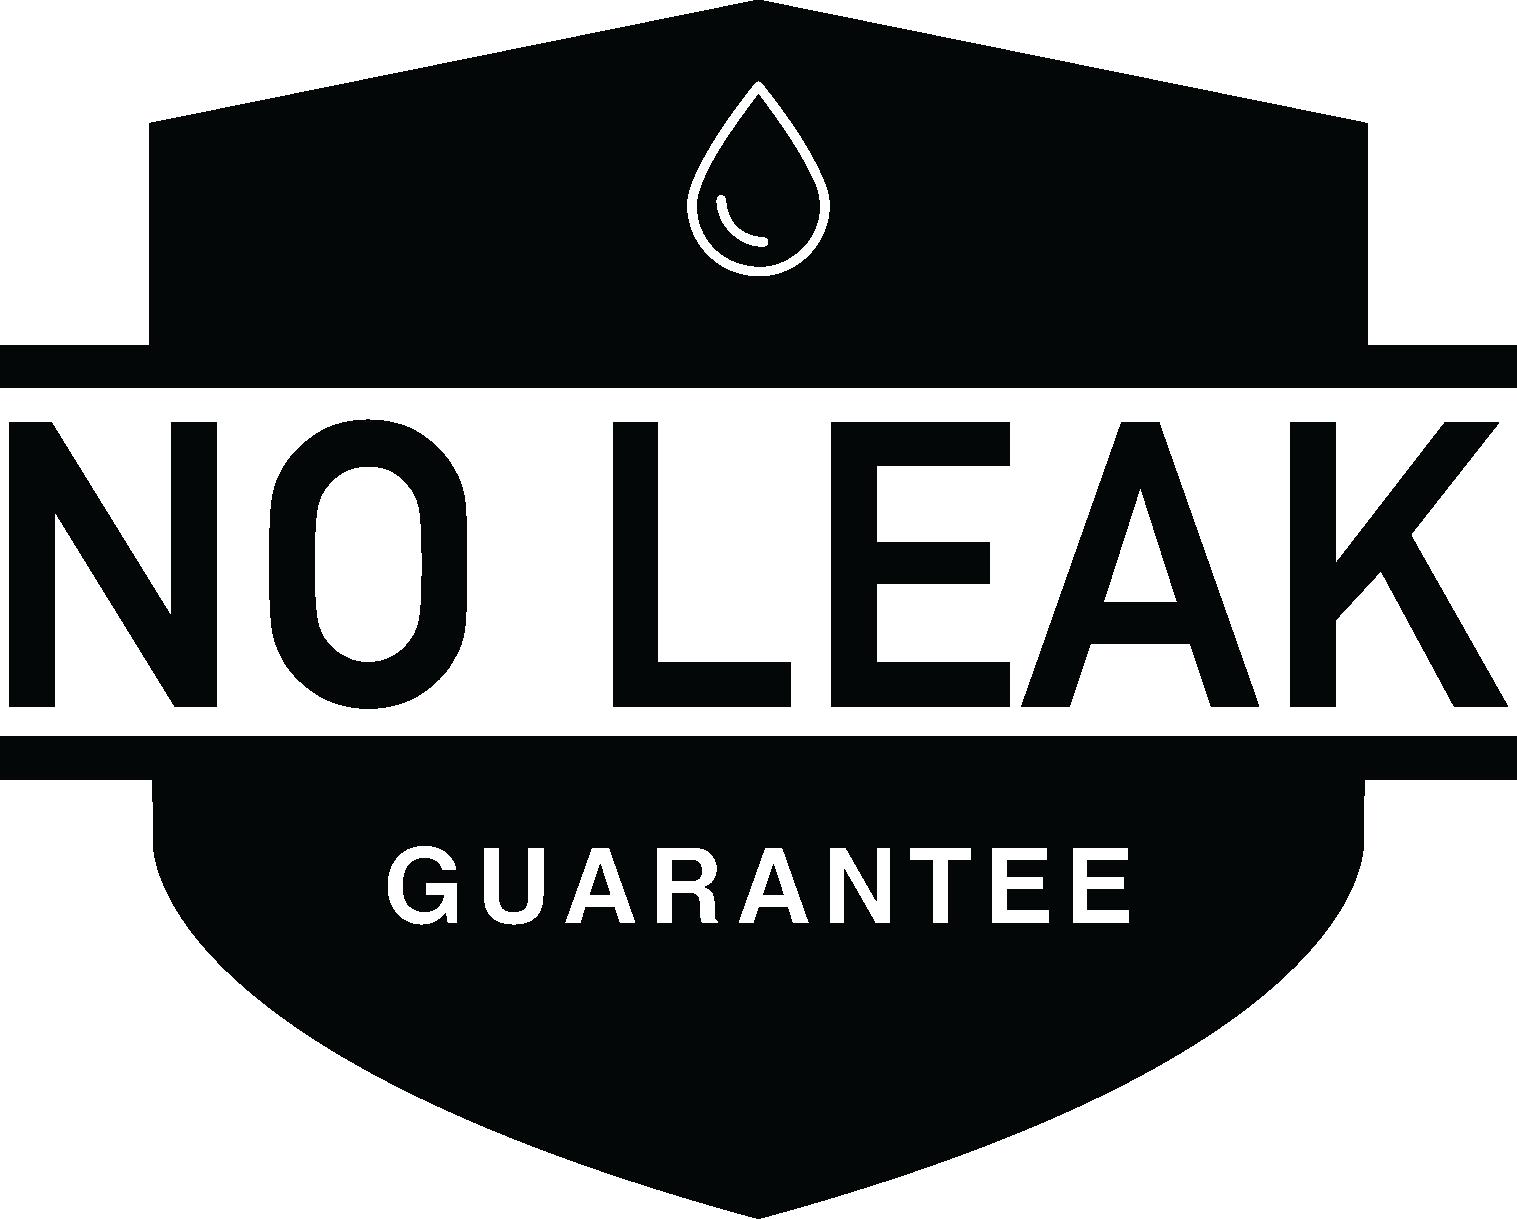 Killarney Metals no leak guarantee shield.